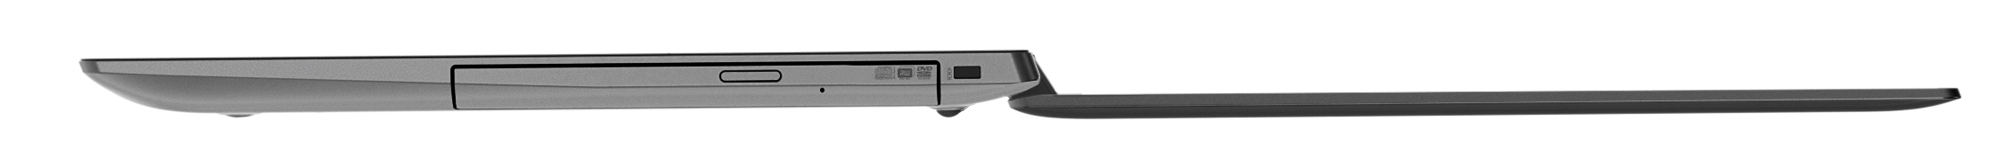 Фото  Ноутбук Lenovo ideapad 330-15 Onyx Black (81DE02EXRA)